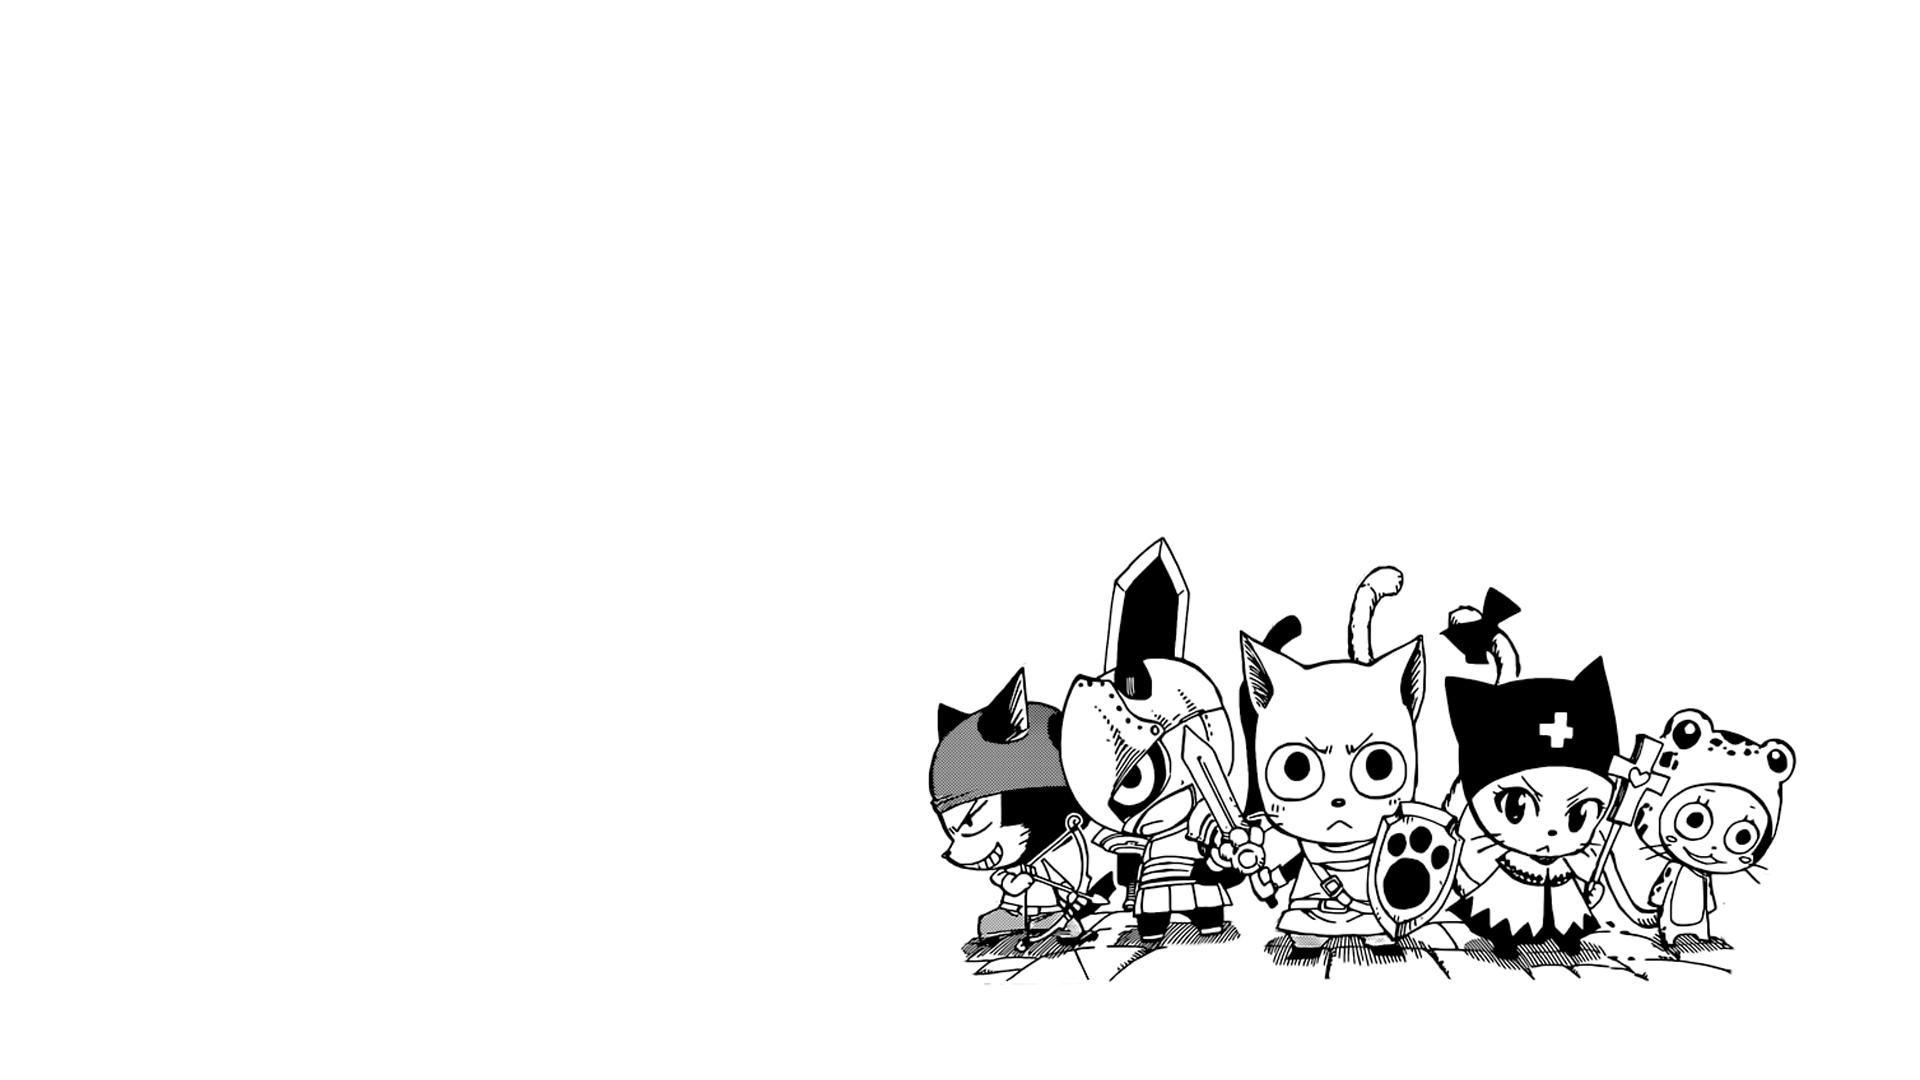 Fairy tail background. Happy cats of manga